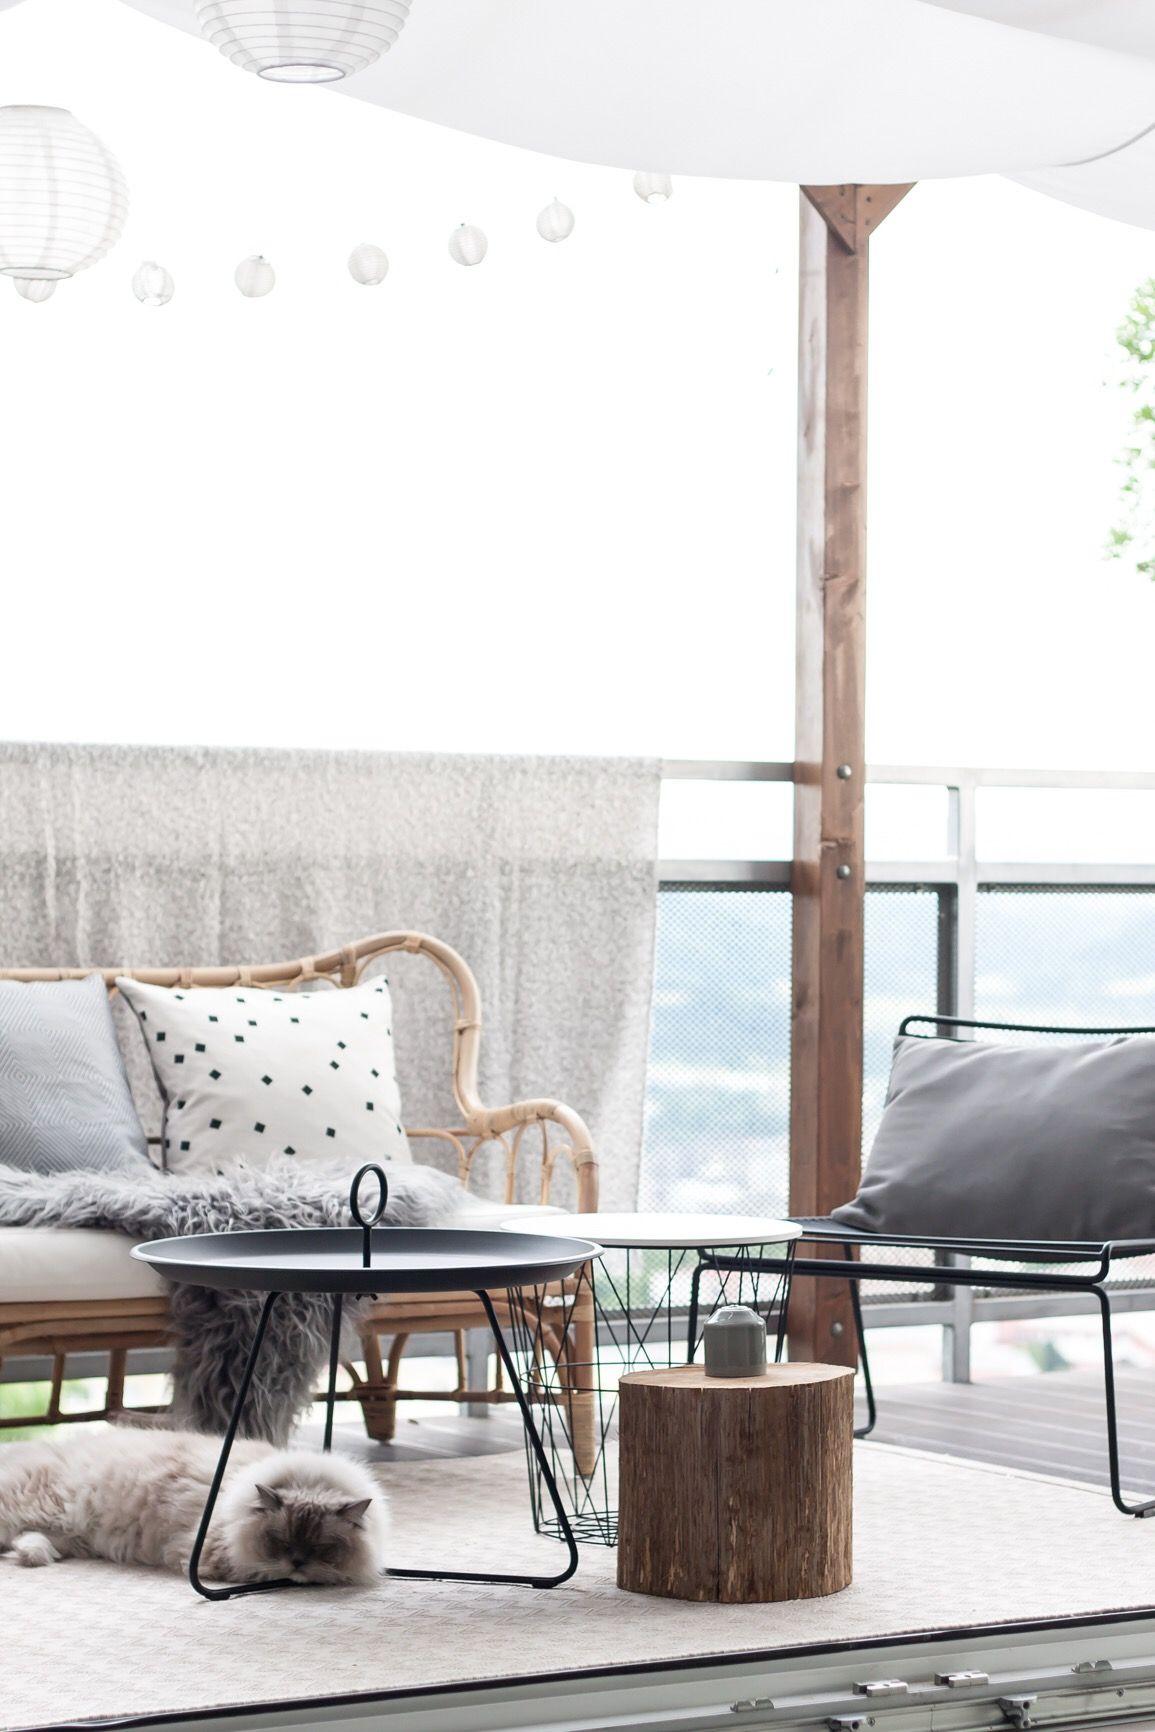 Hay Hee Lounge Chair Combined With Rattan Mastholmen Ikea Sofa Ikea Sofas Wohnzimmer Ideen Interieur